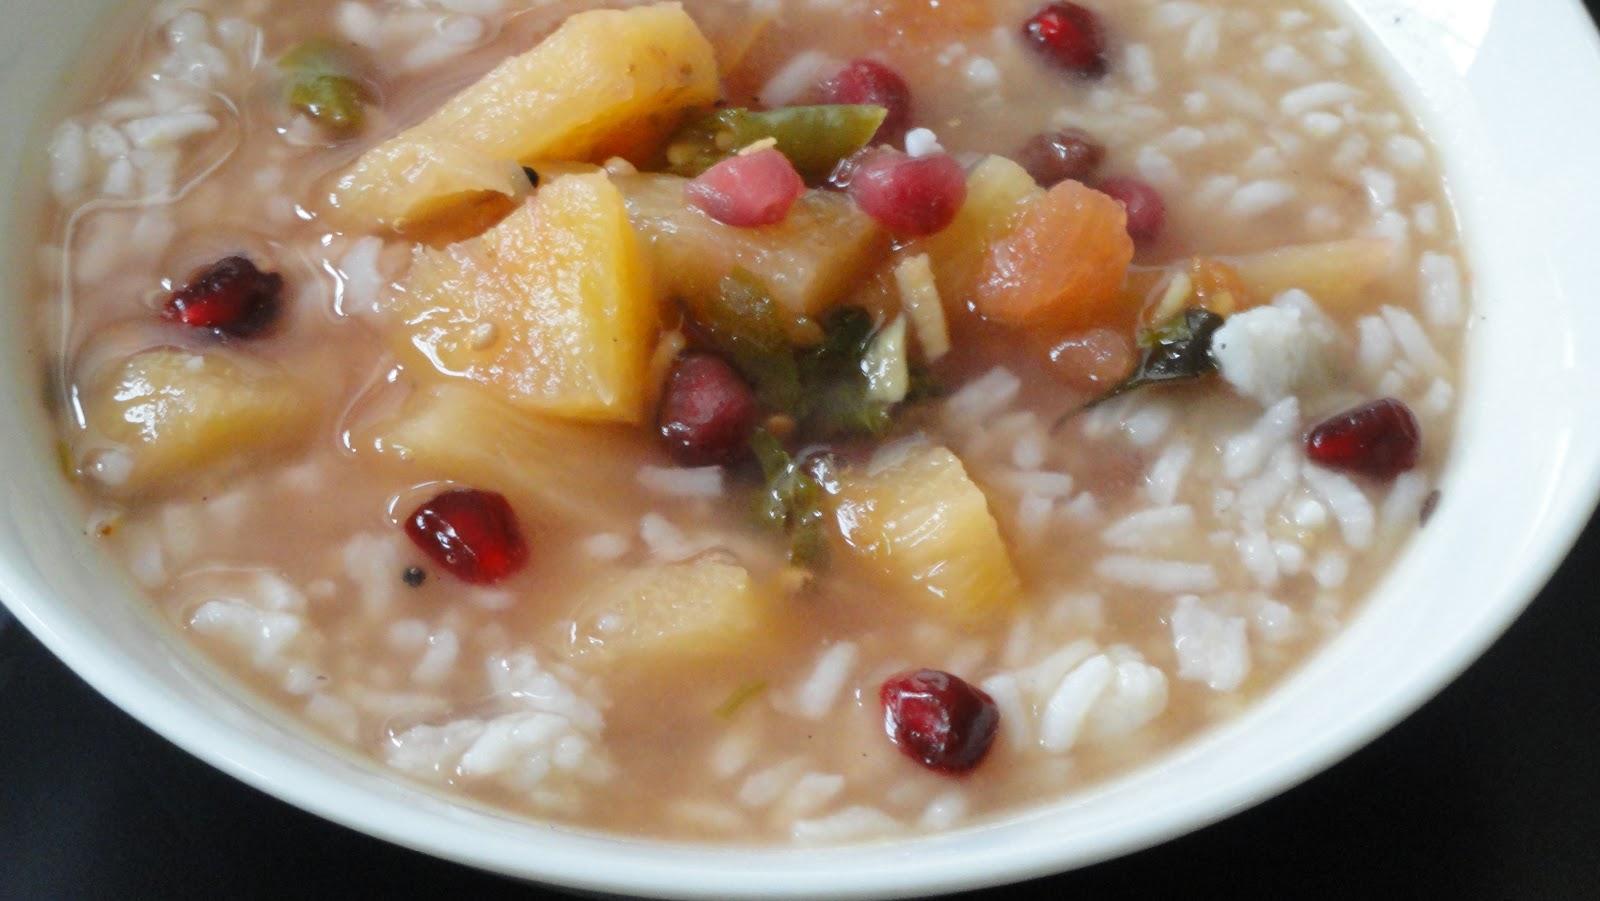 Peek into My Kitchen: Pomegranate ~ Pineapple Rasam / Lentil Soup